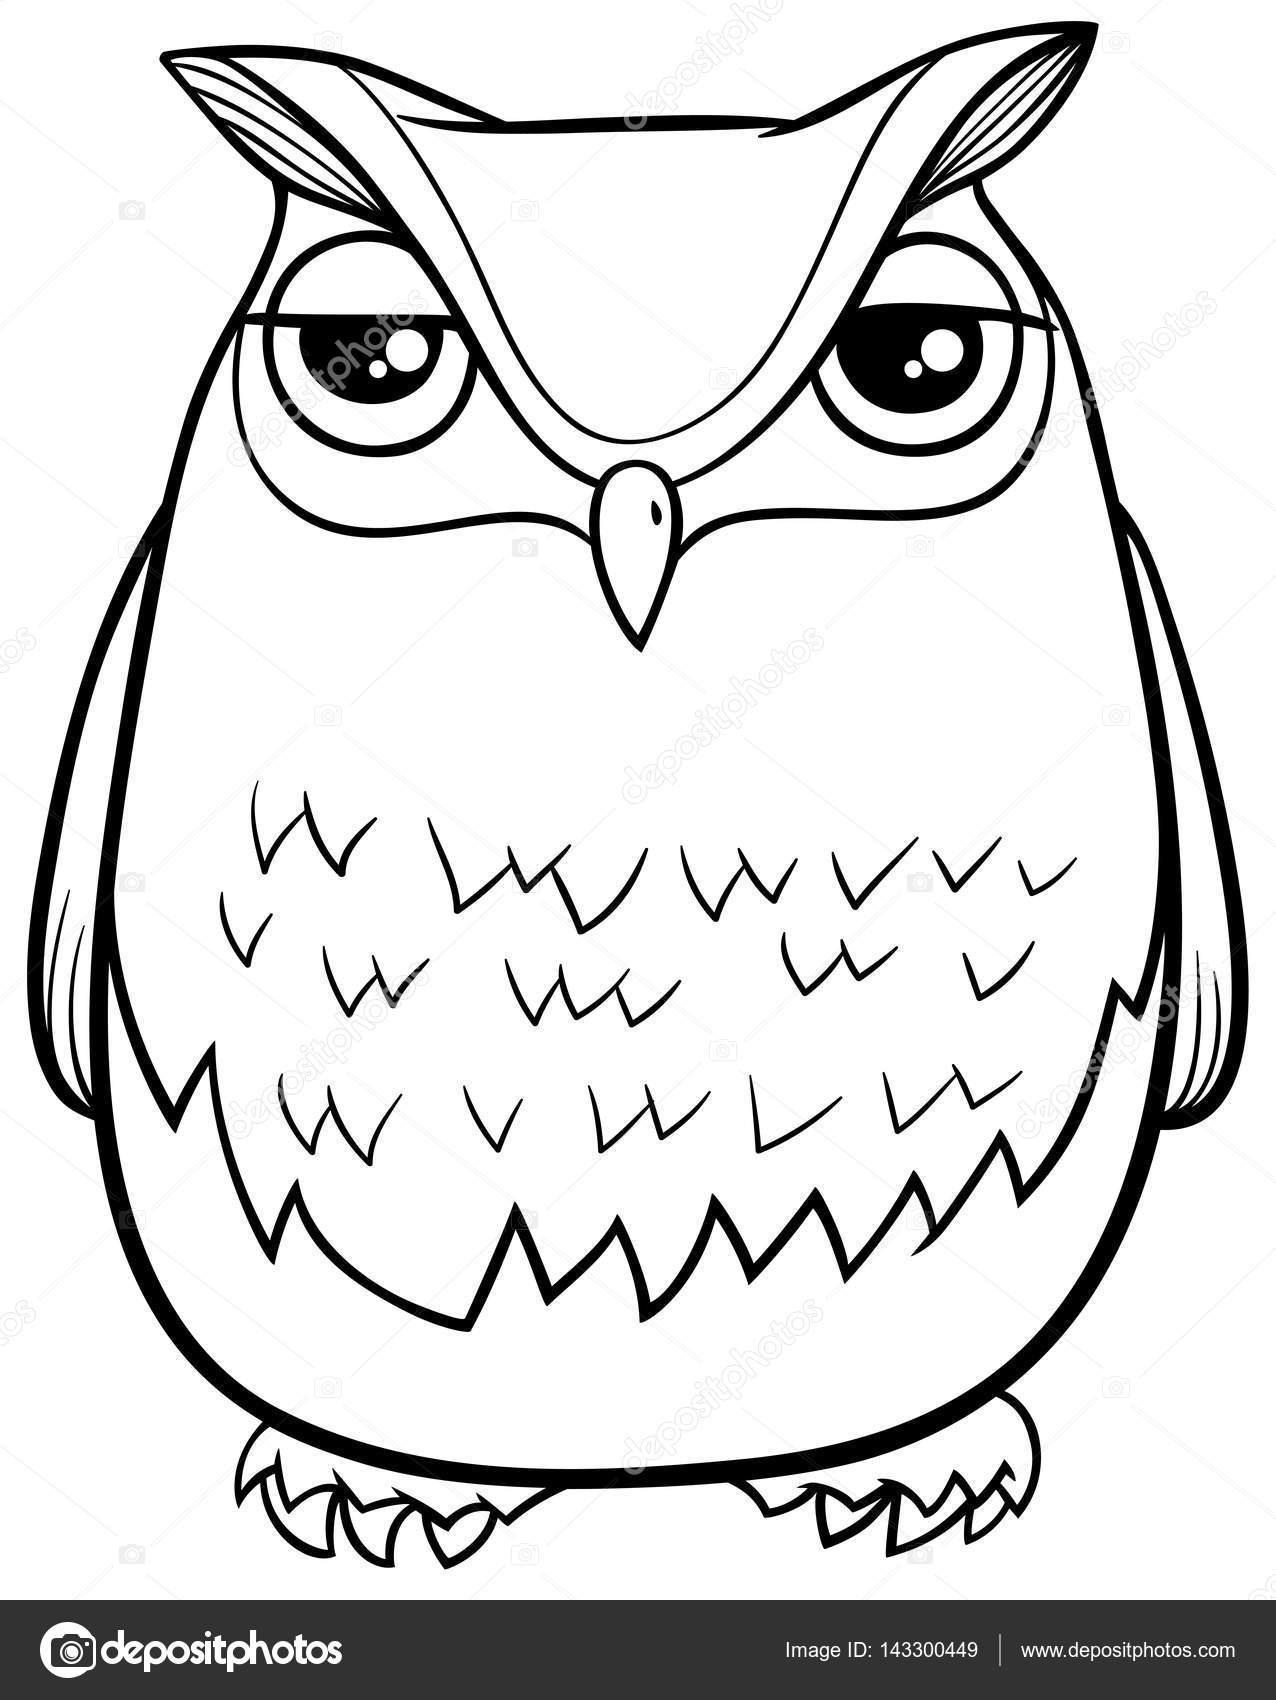 Cartoon Owl Coloring Page Stock Vector C Izakowski 143300449